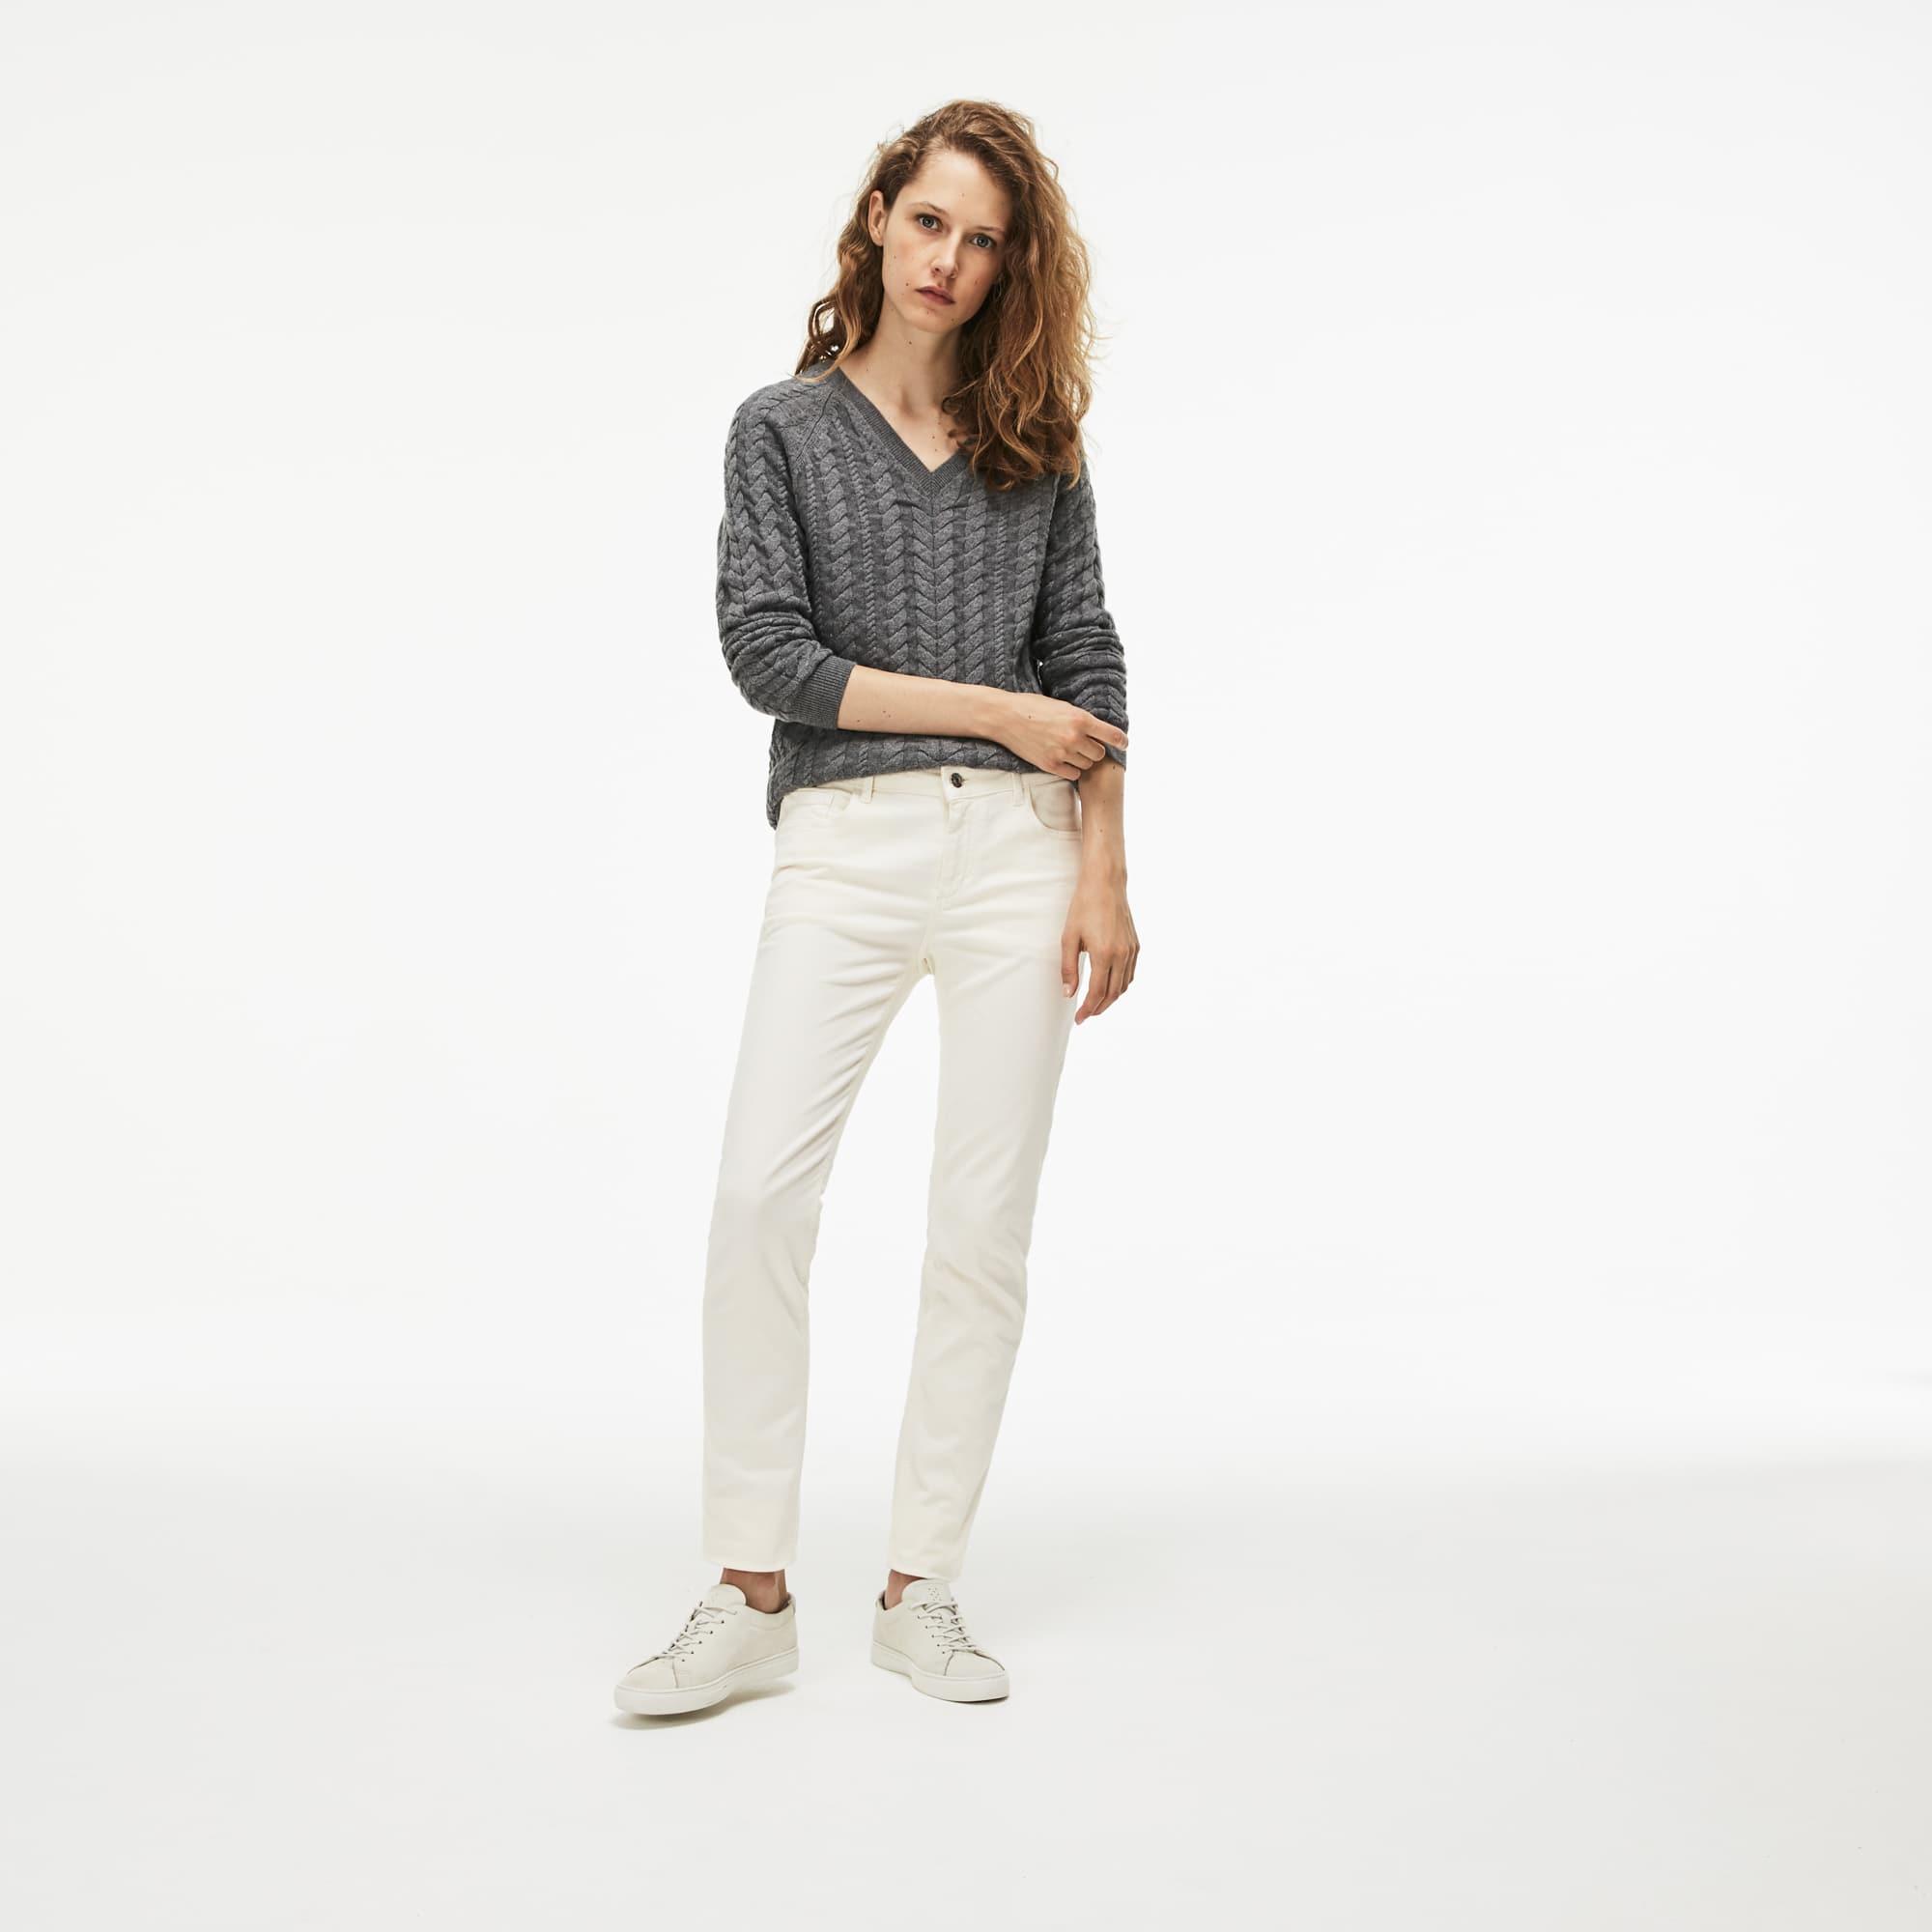 Jeans Dames Slim Fit Katoendenim met Stretch